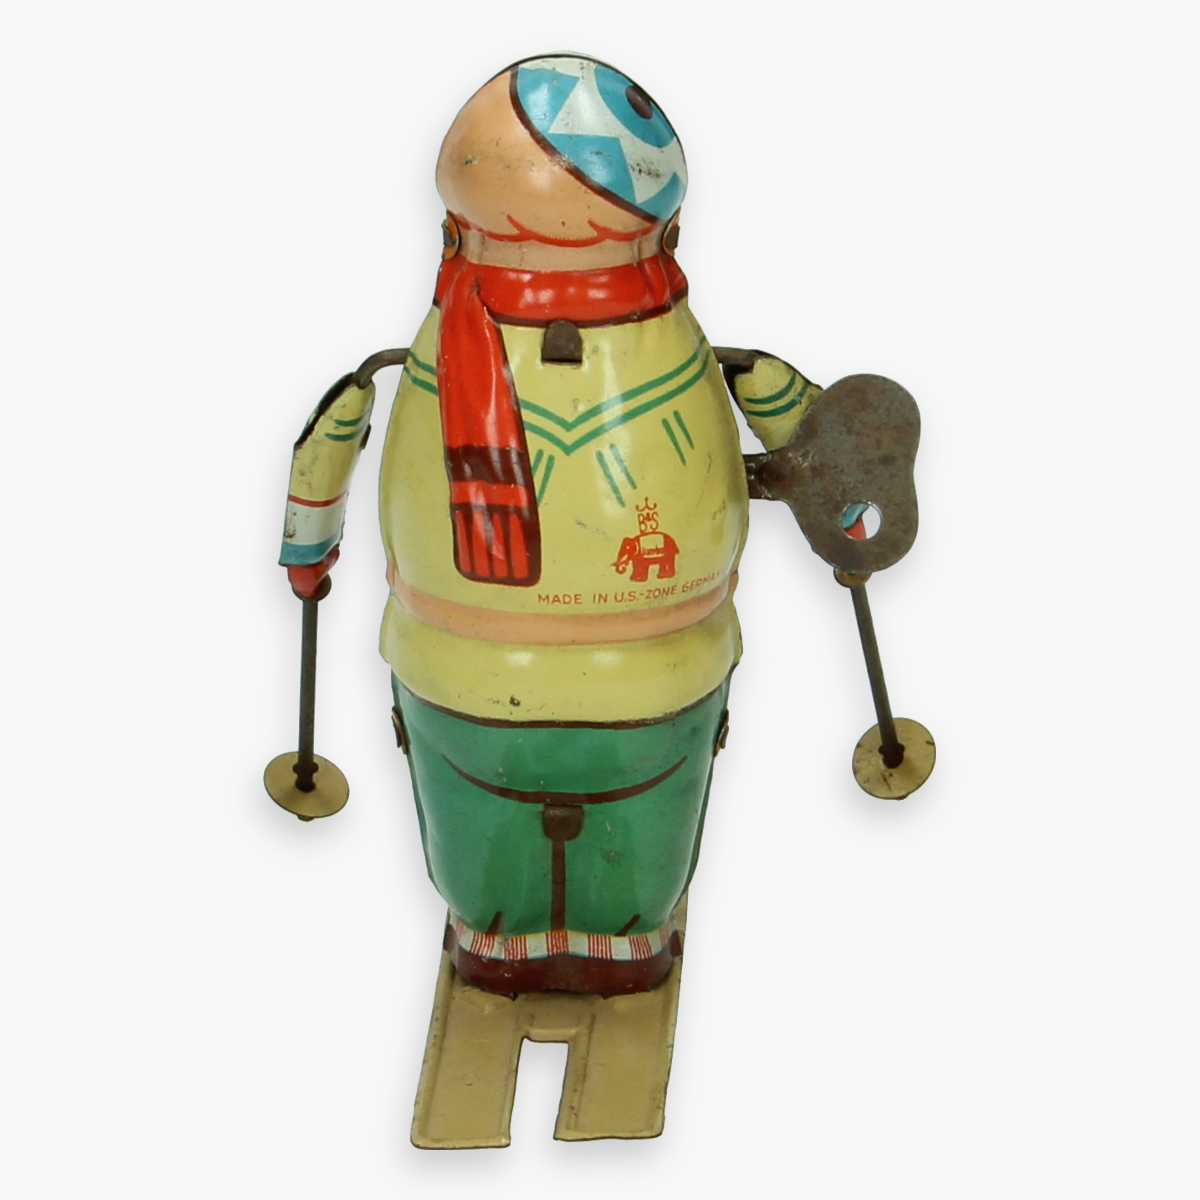 Afbeeldingen van blechtspielzeug skifahrer blomer & shüler made in us zone Germany